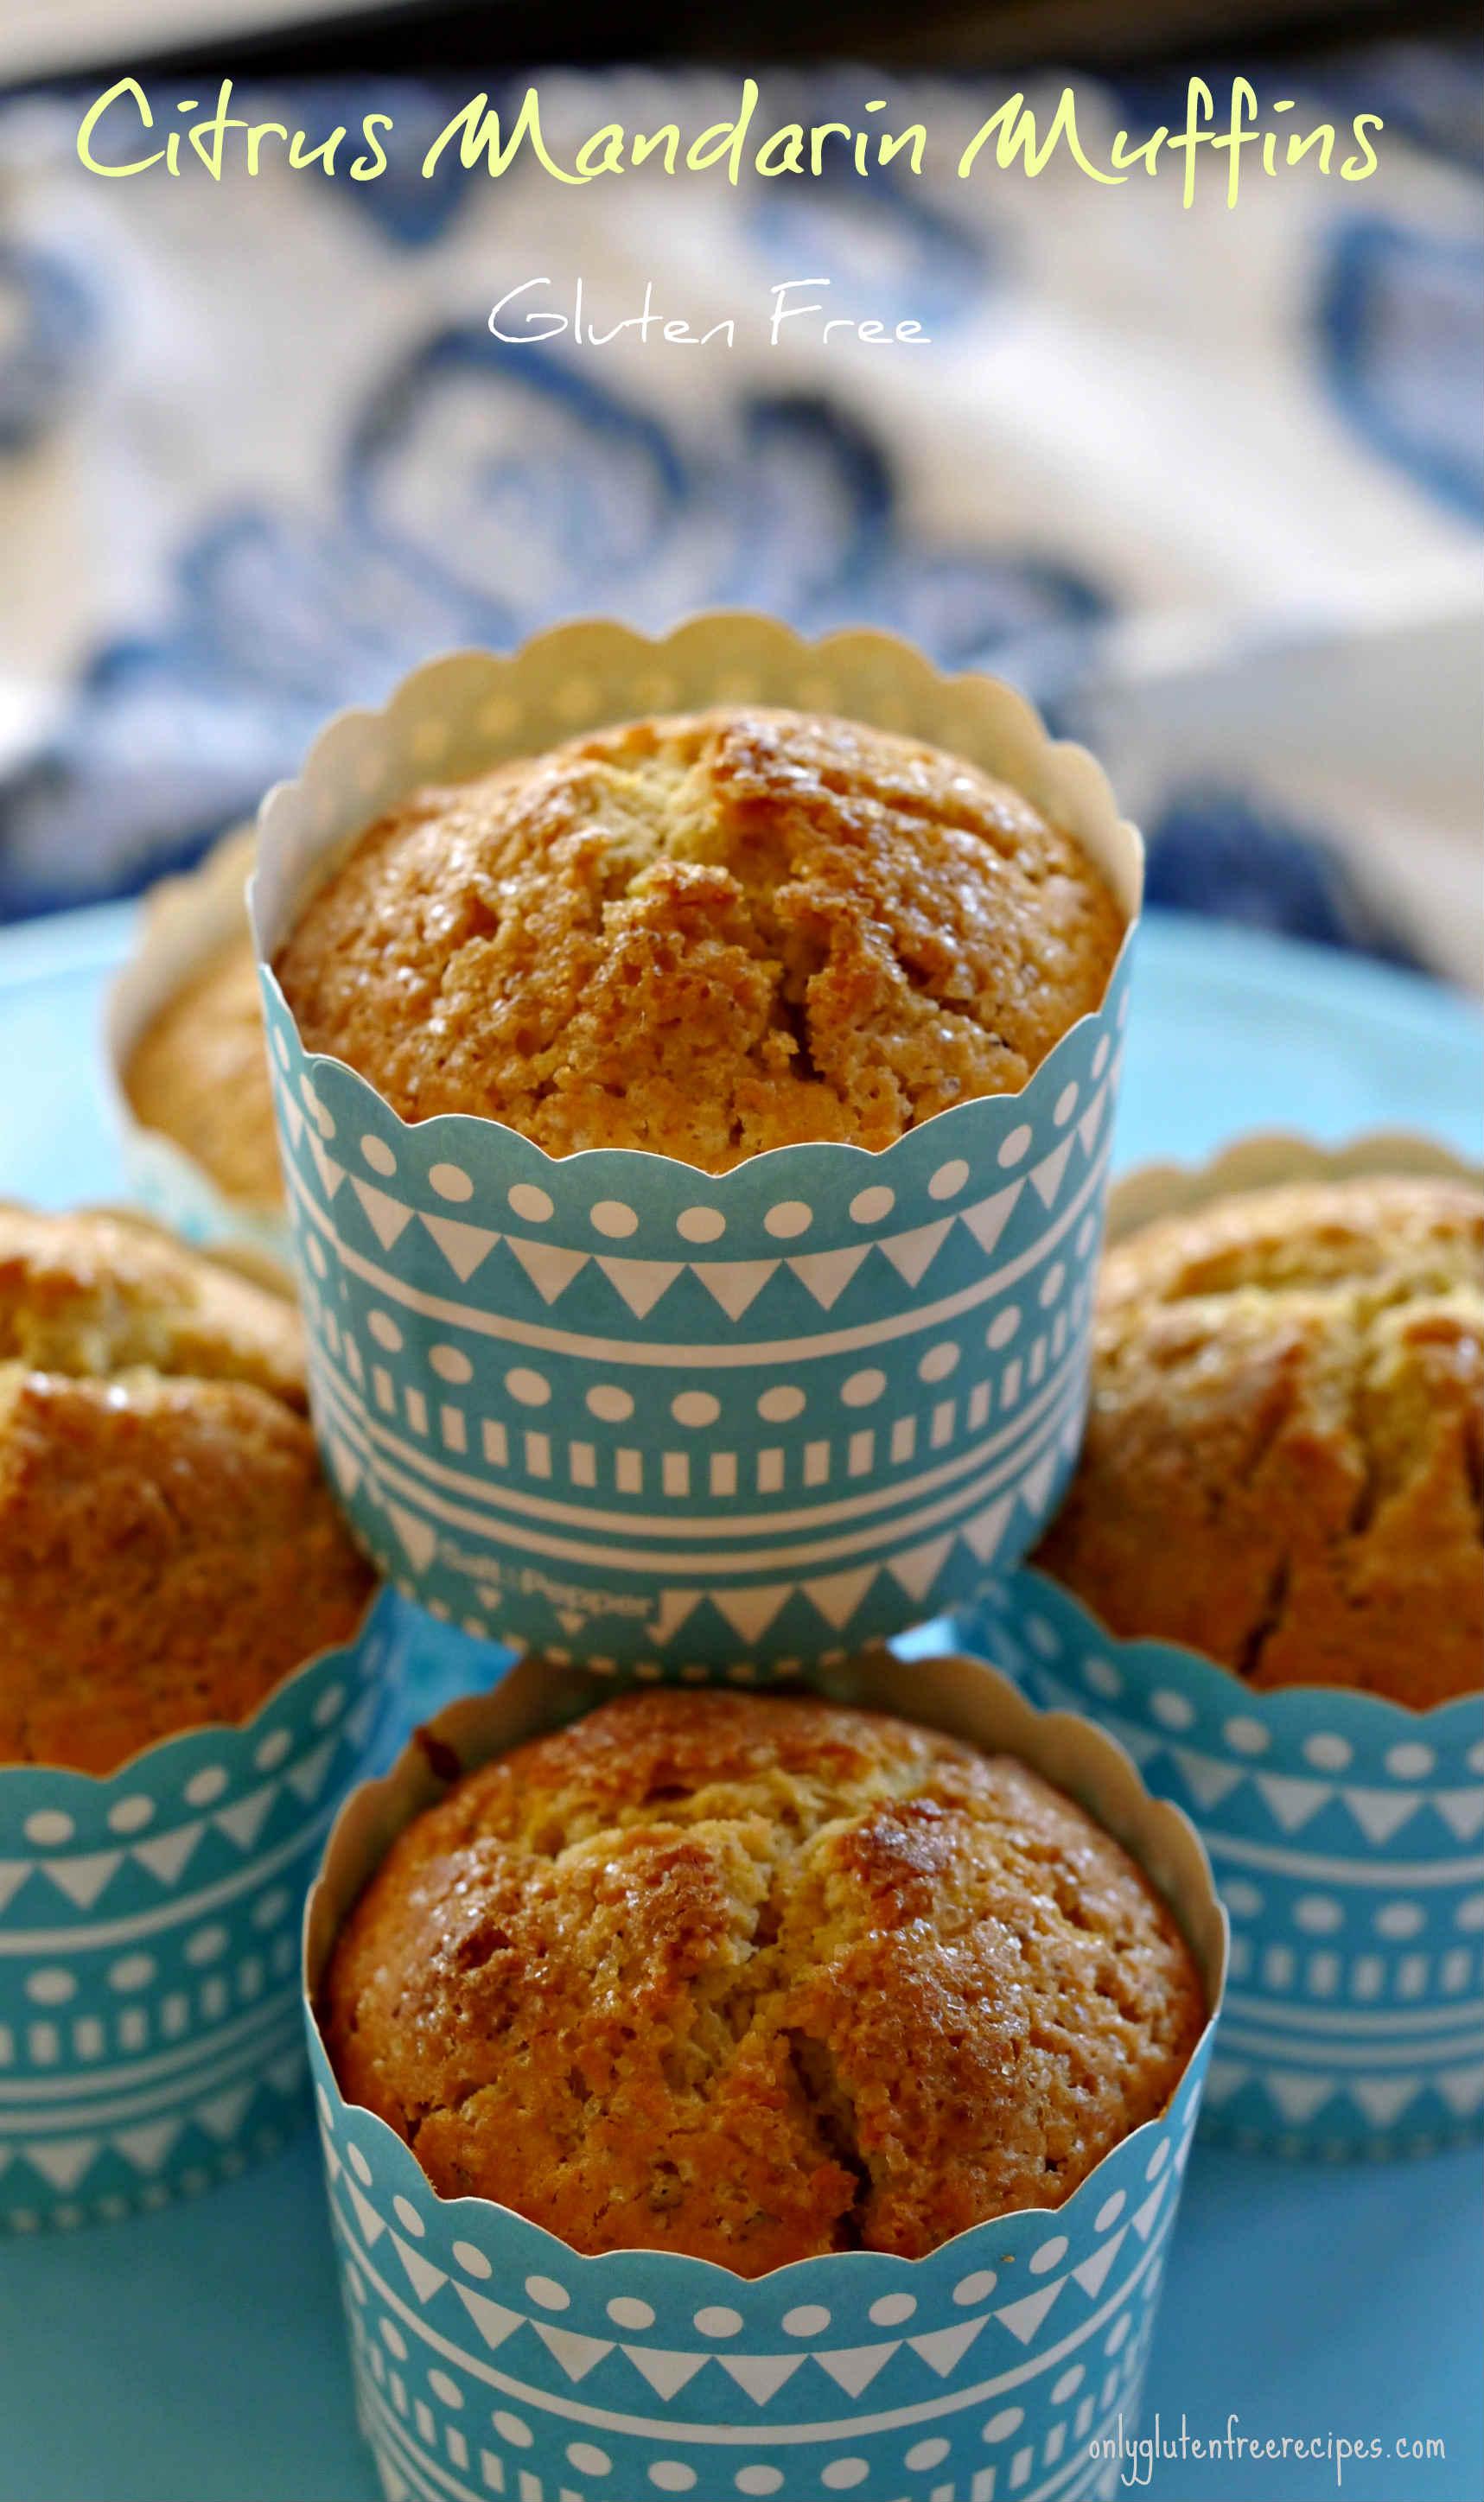 Gluten-Free Citrus Mandarin Muffins